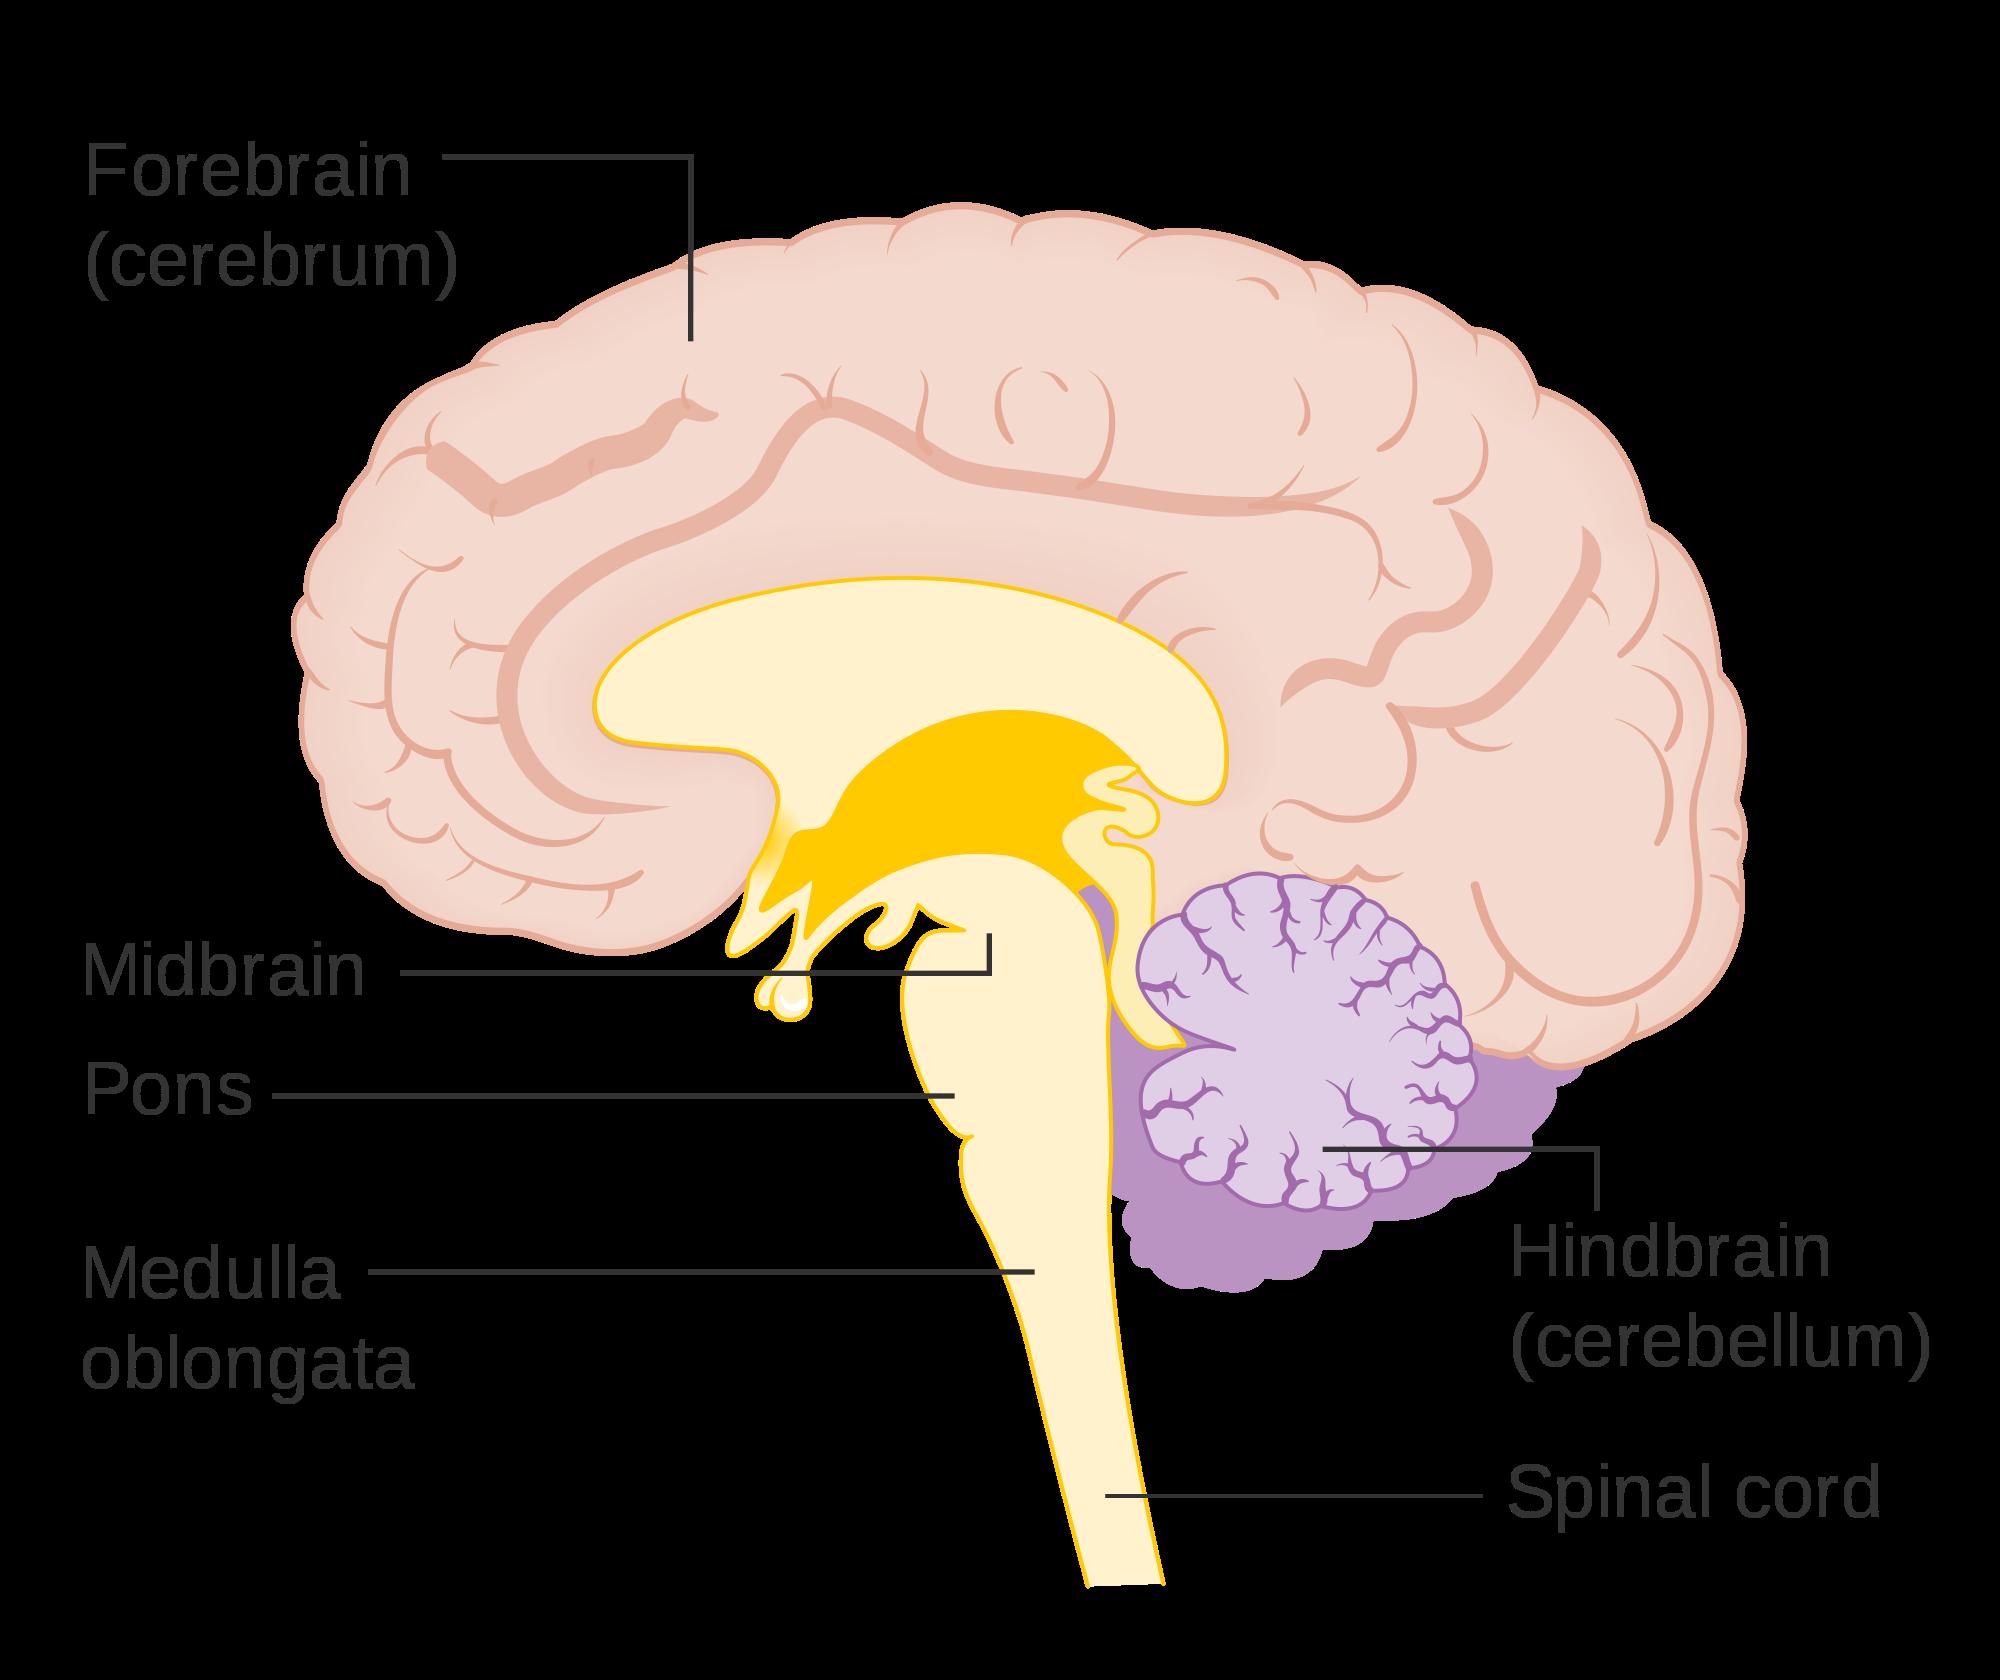 Psychology clipart midbrain. Hindbrain anatomy lifeinharmony